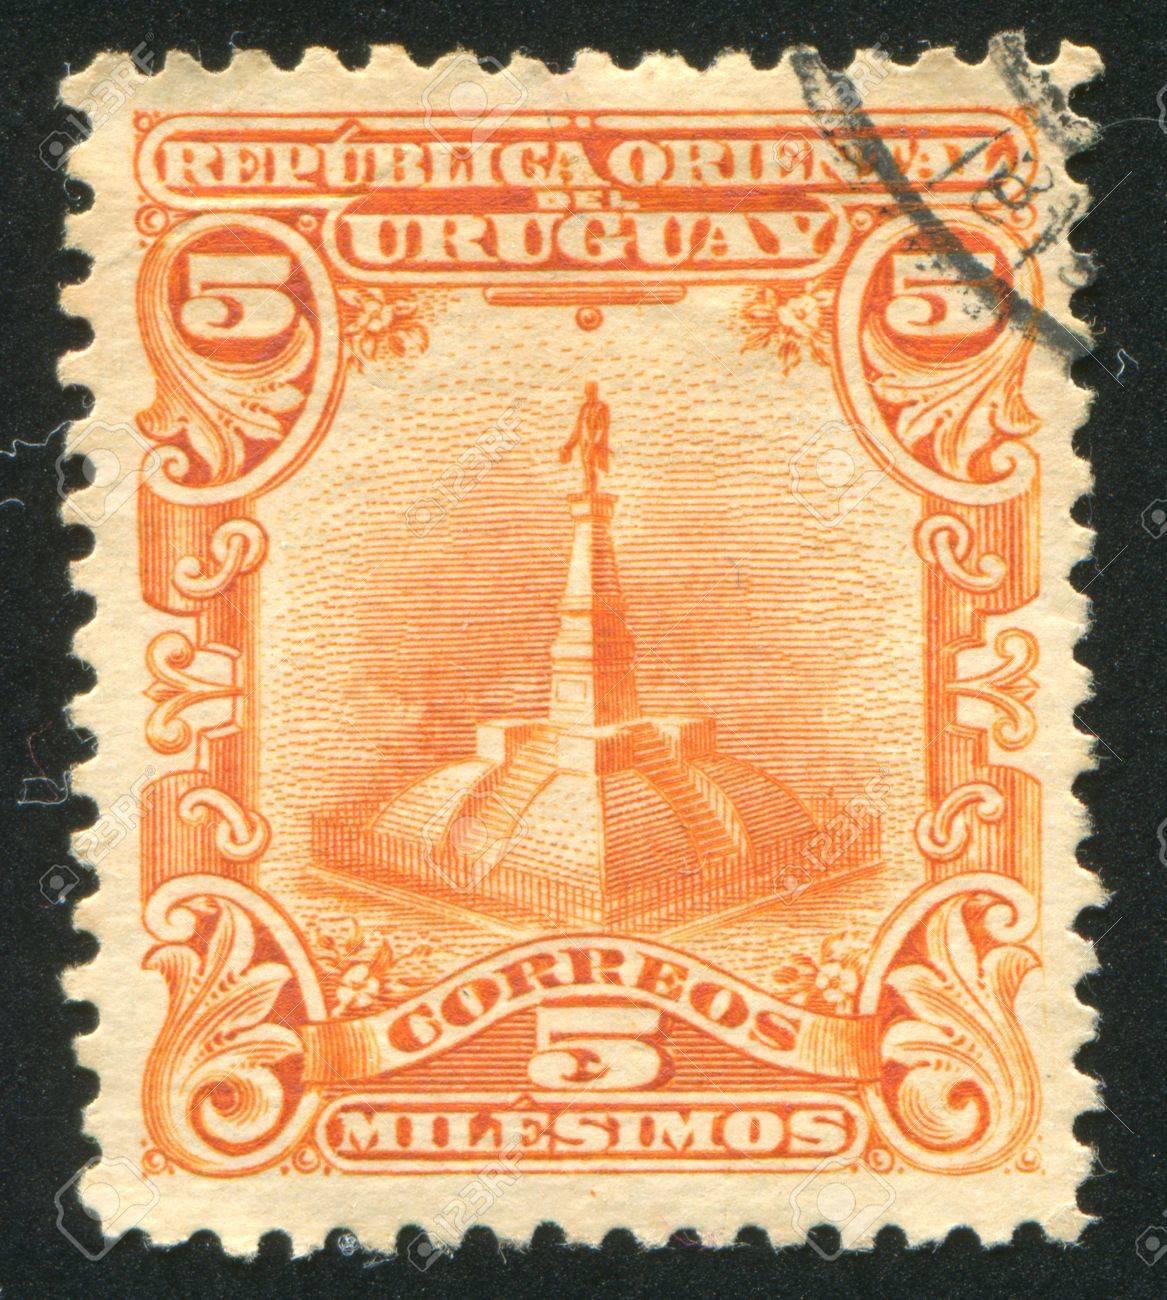 URUGUAY - CIRCA 1899: stamp printed by Uruguay, shows Statue of Artigas, circa 1899 Stock Photo - 13981856